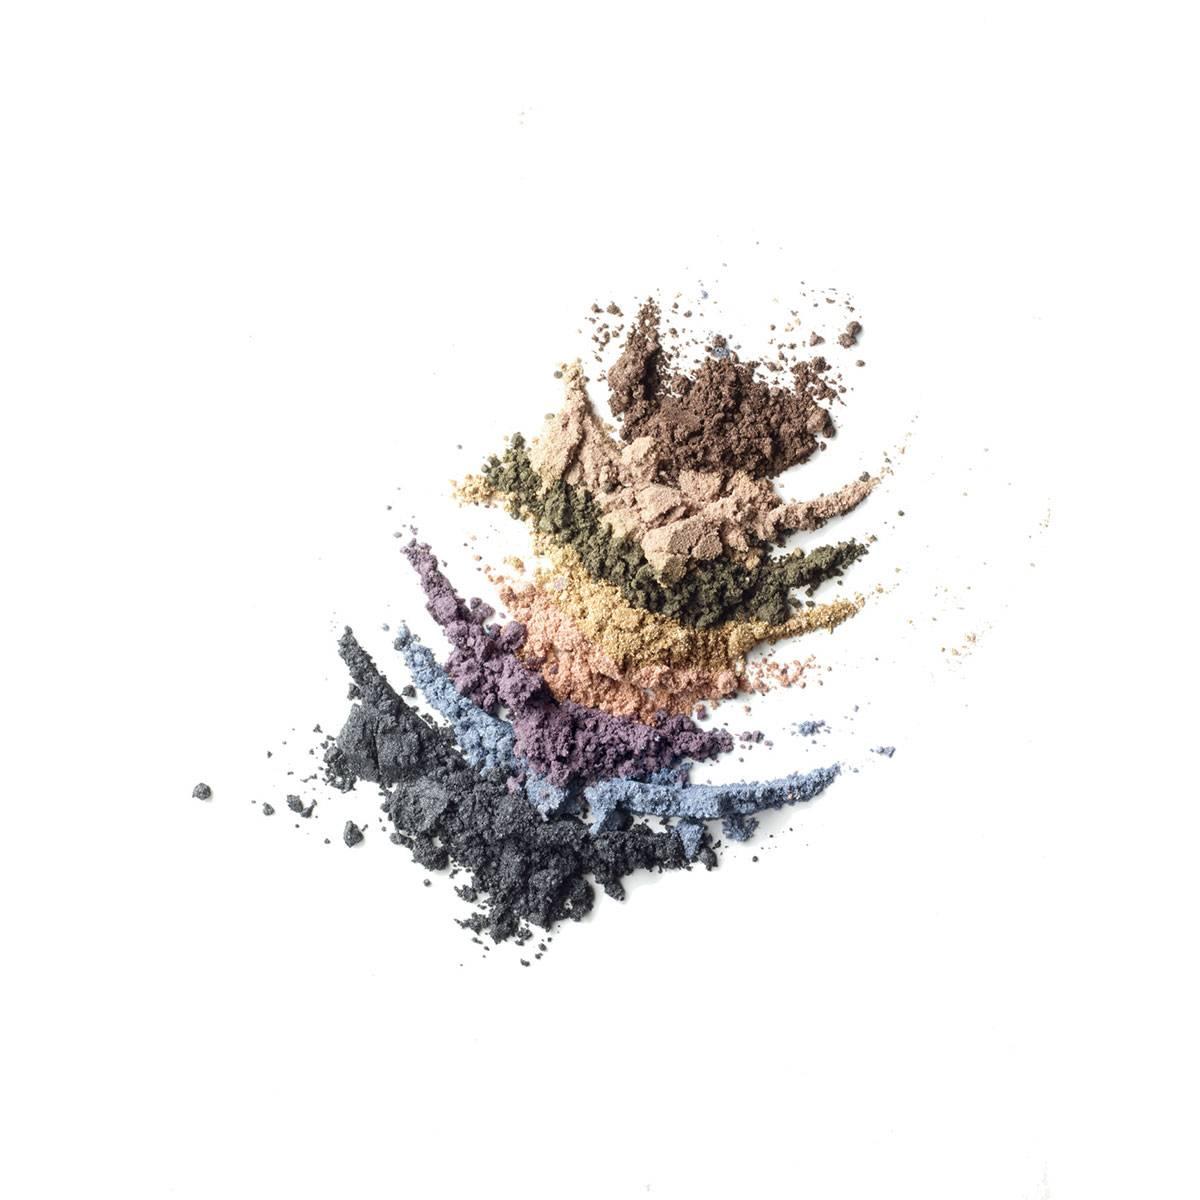 La Roche Posay Känslig Toleriane Make up EYE_SHADOW Texture